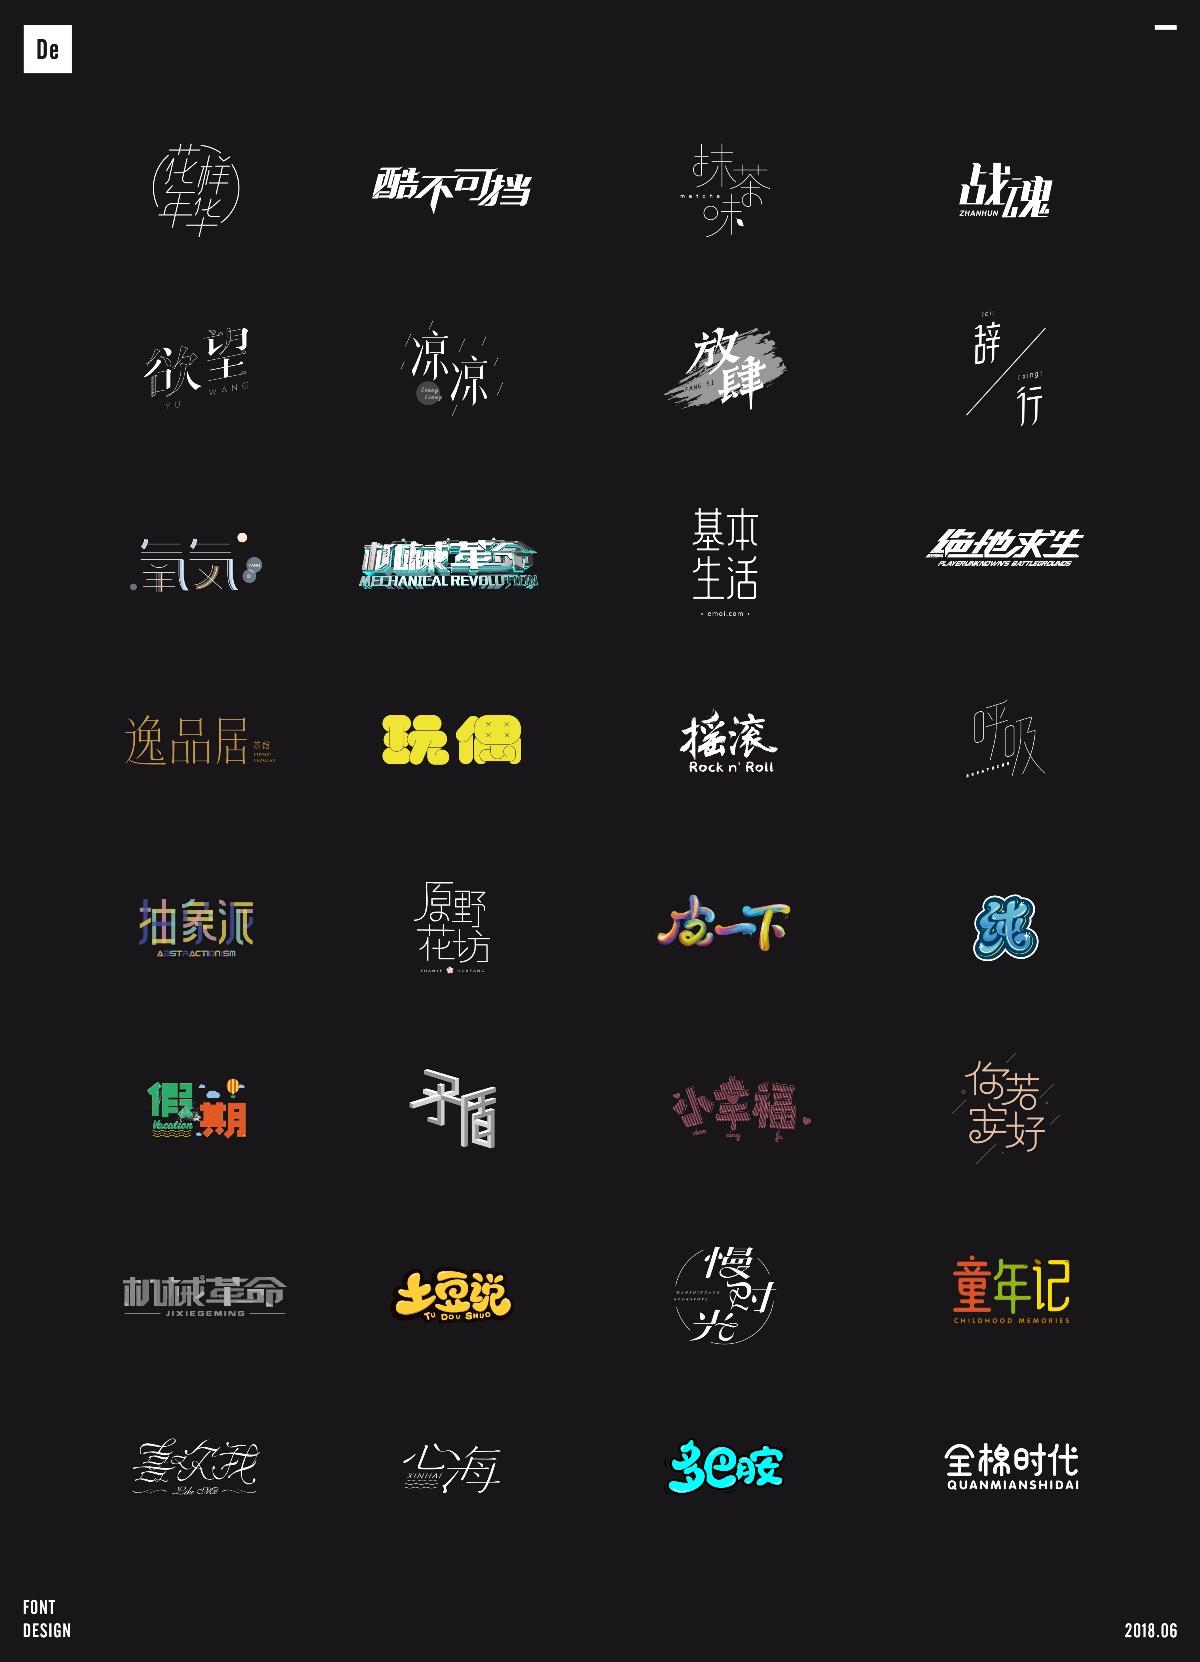 DEDE   字体设计 第一期